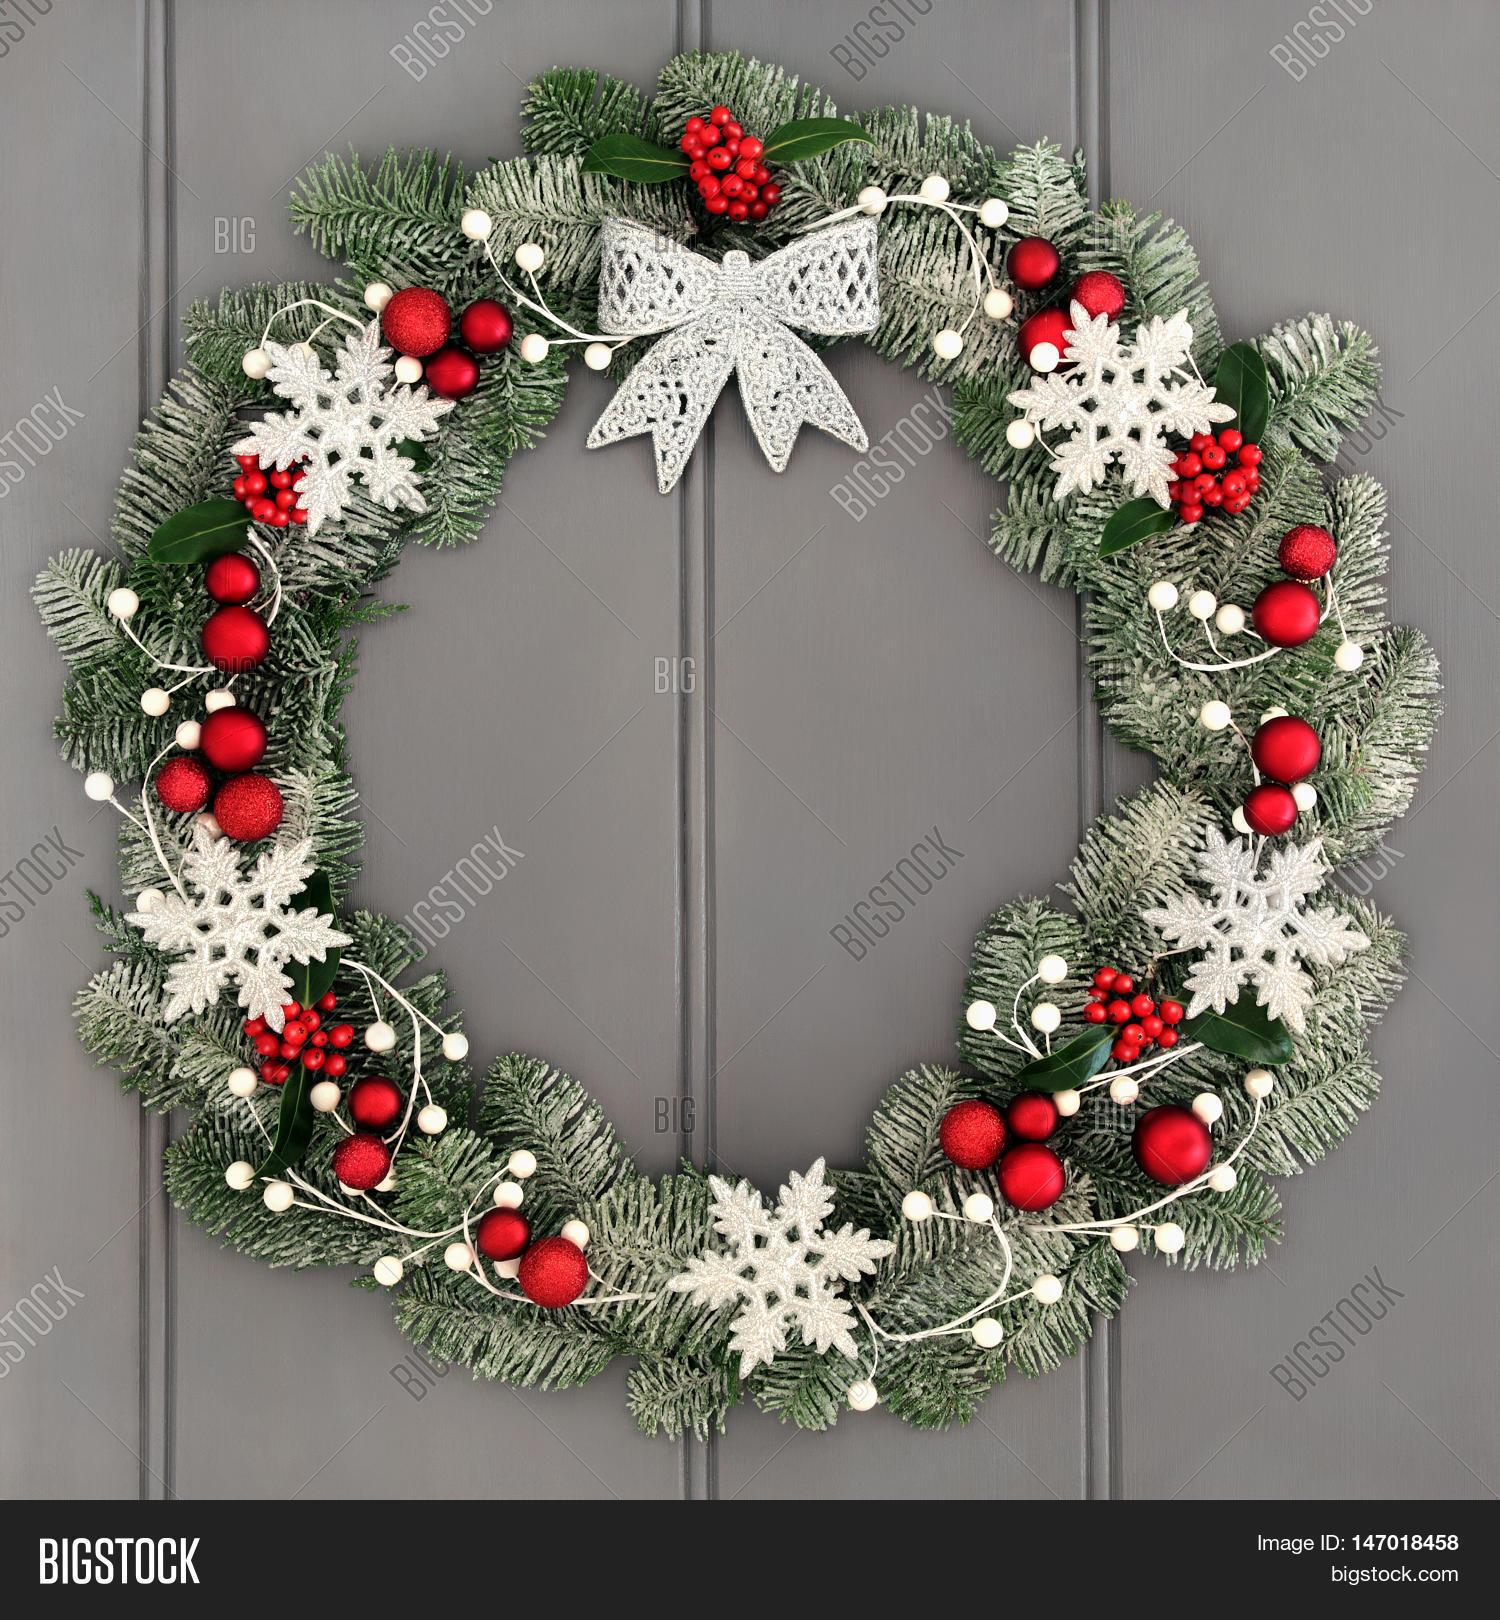 Christmas Wreath Decoration Silver Image & Photo | Bigstock